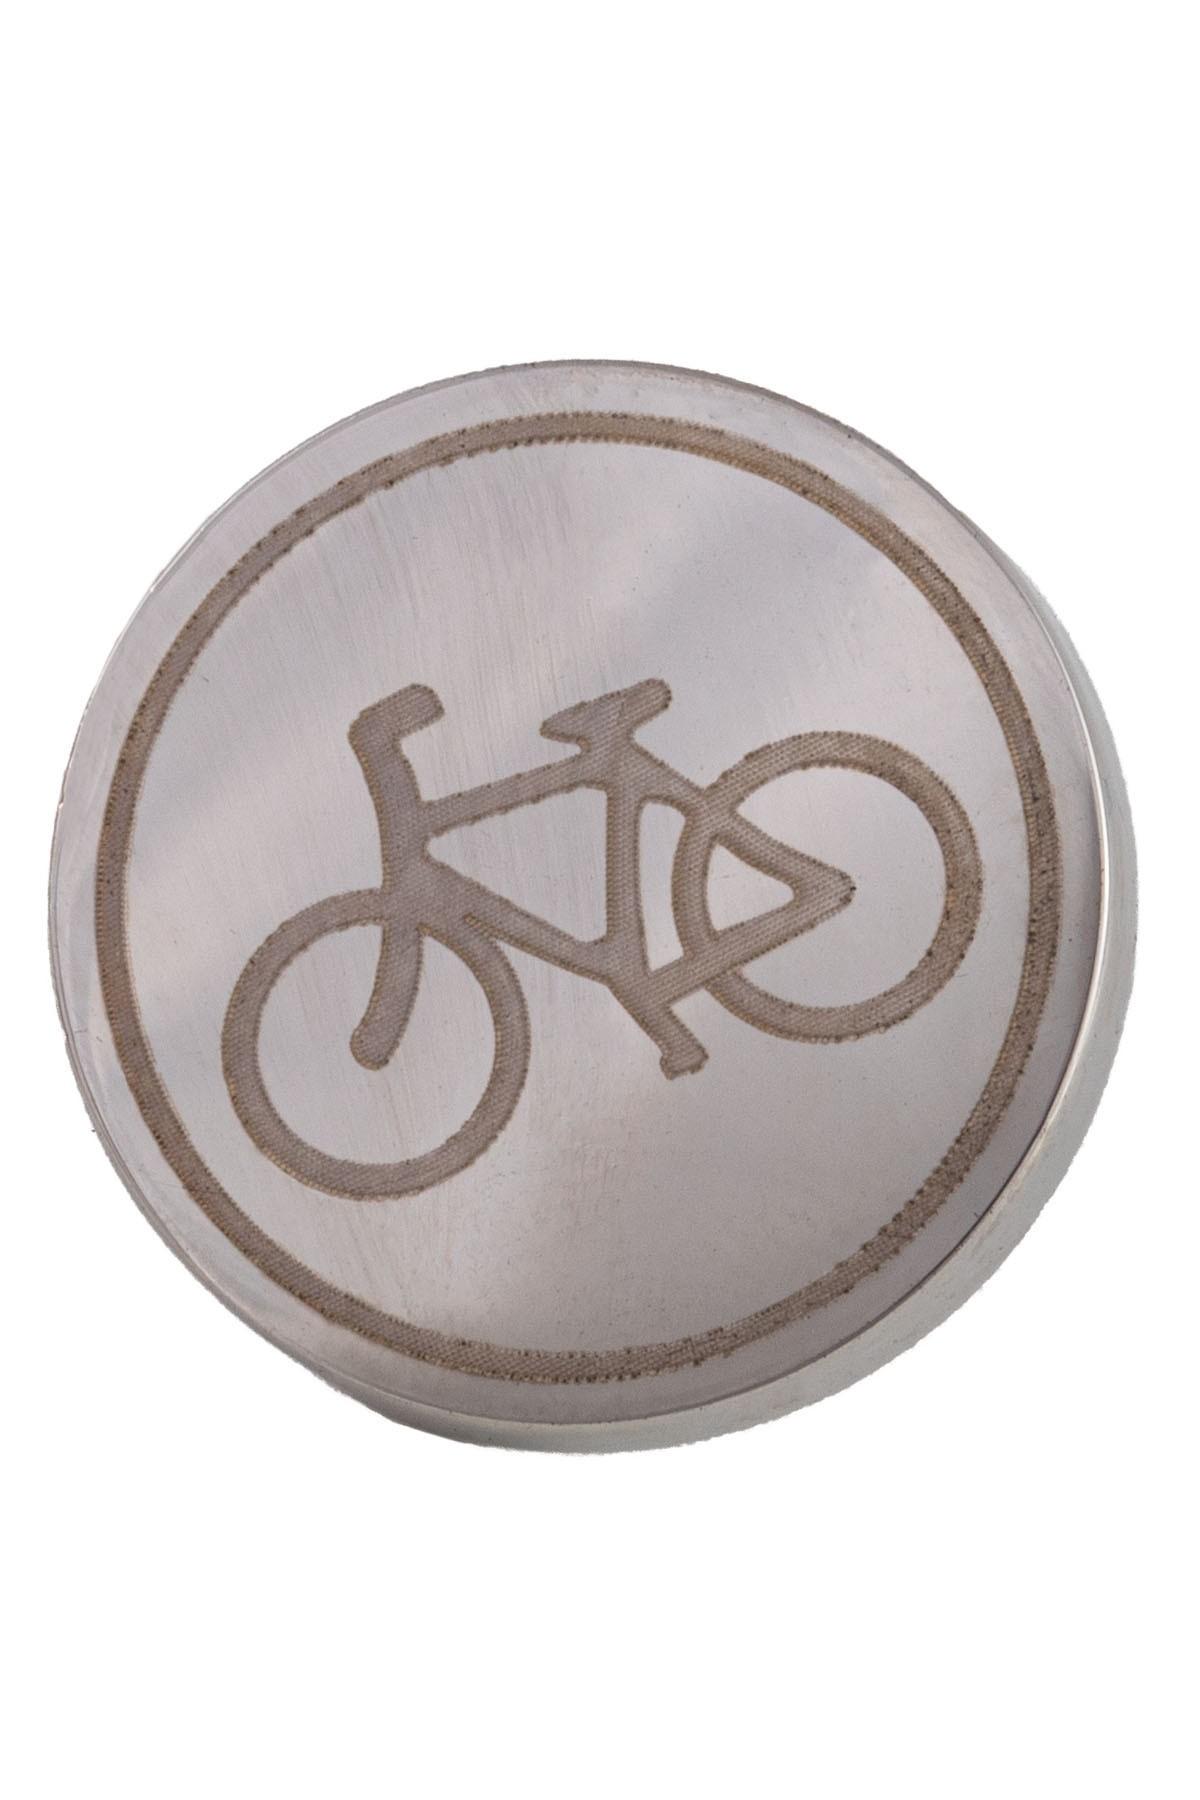 wpinka do butonierki rower